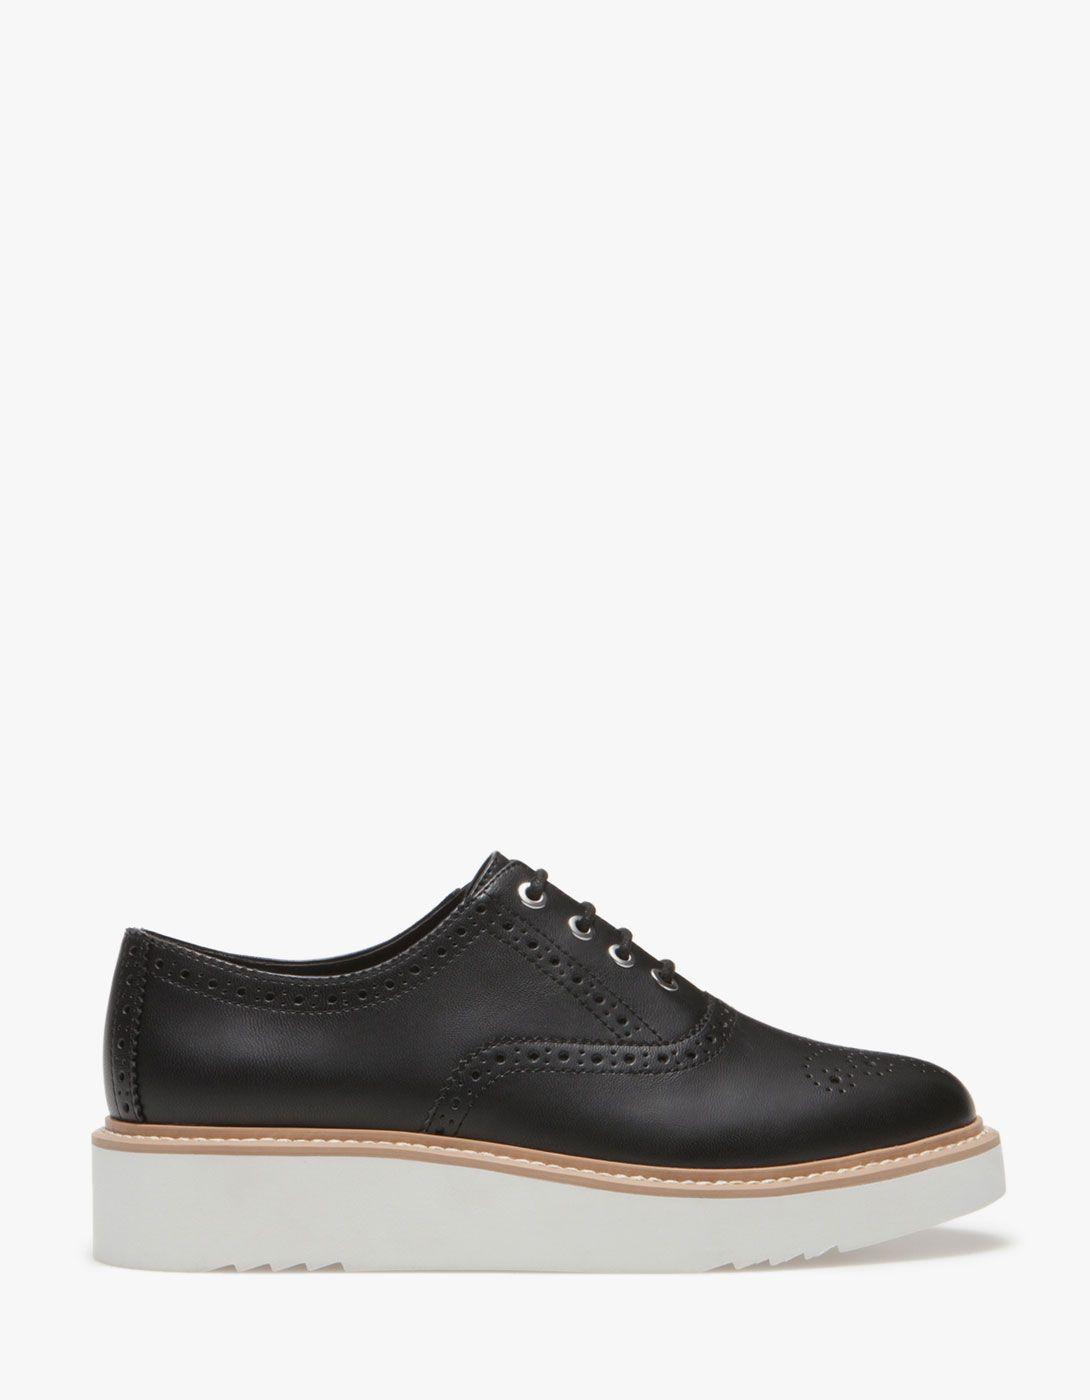 Strange Sapatos PicadosWishing Moda Blucher Pinterest nP8kw0O